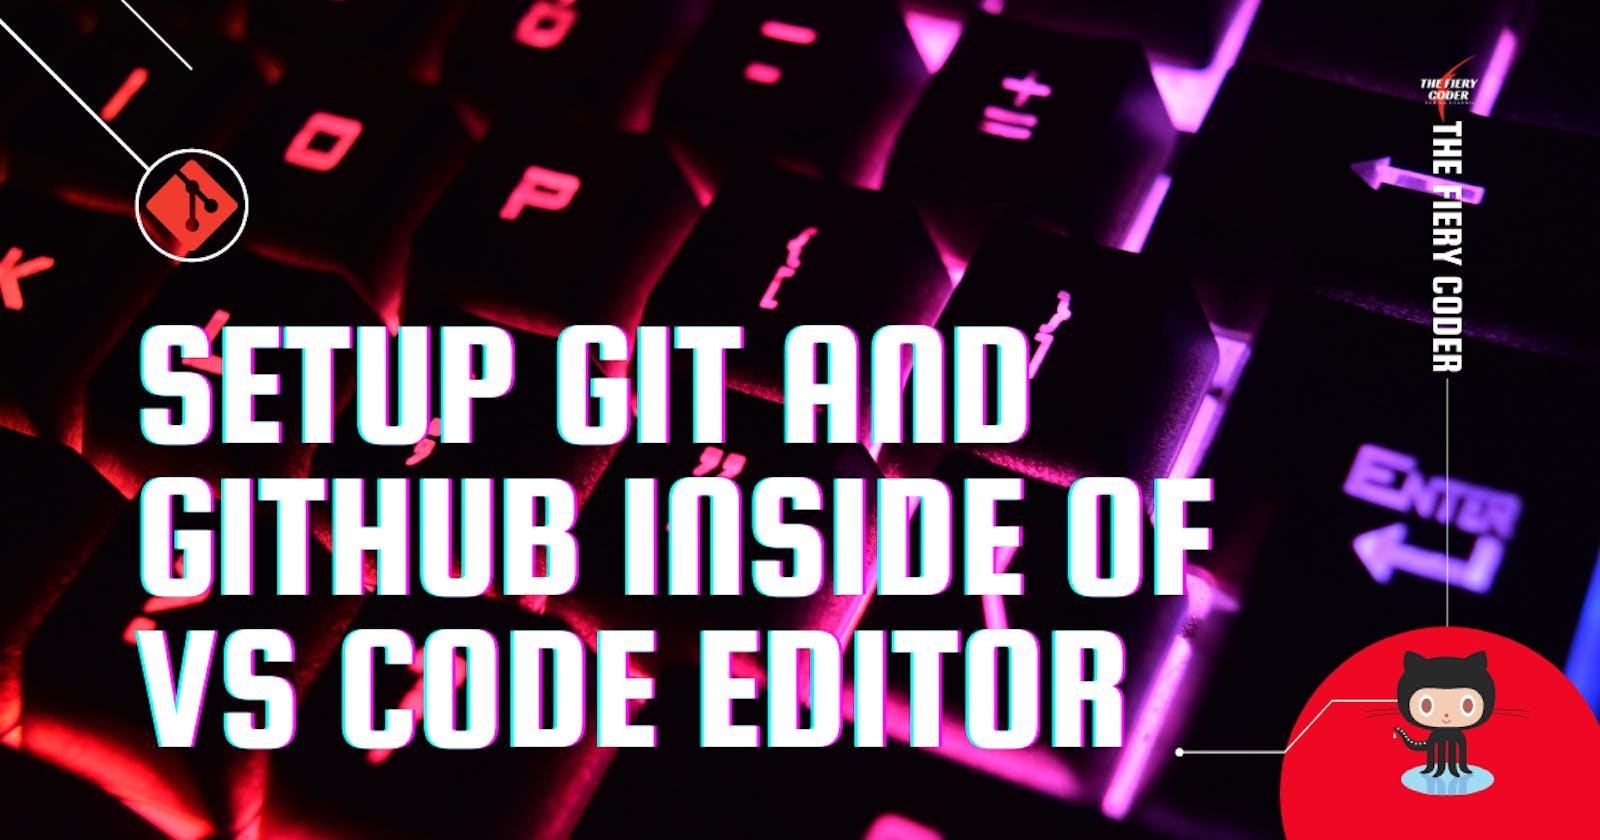 How to use Git and GitHub inside of VS Code Editor